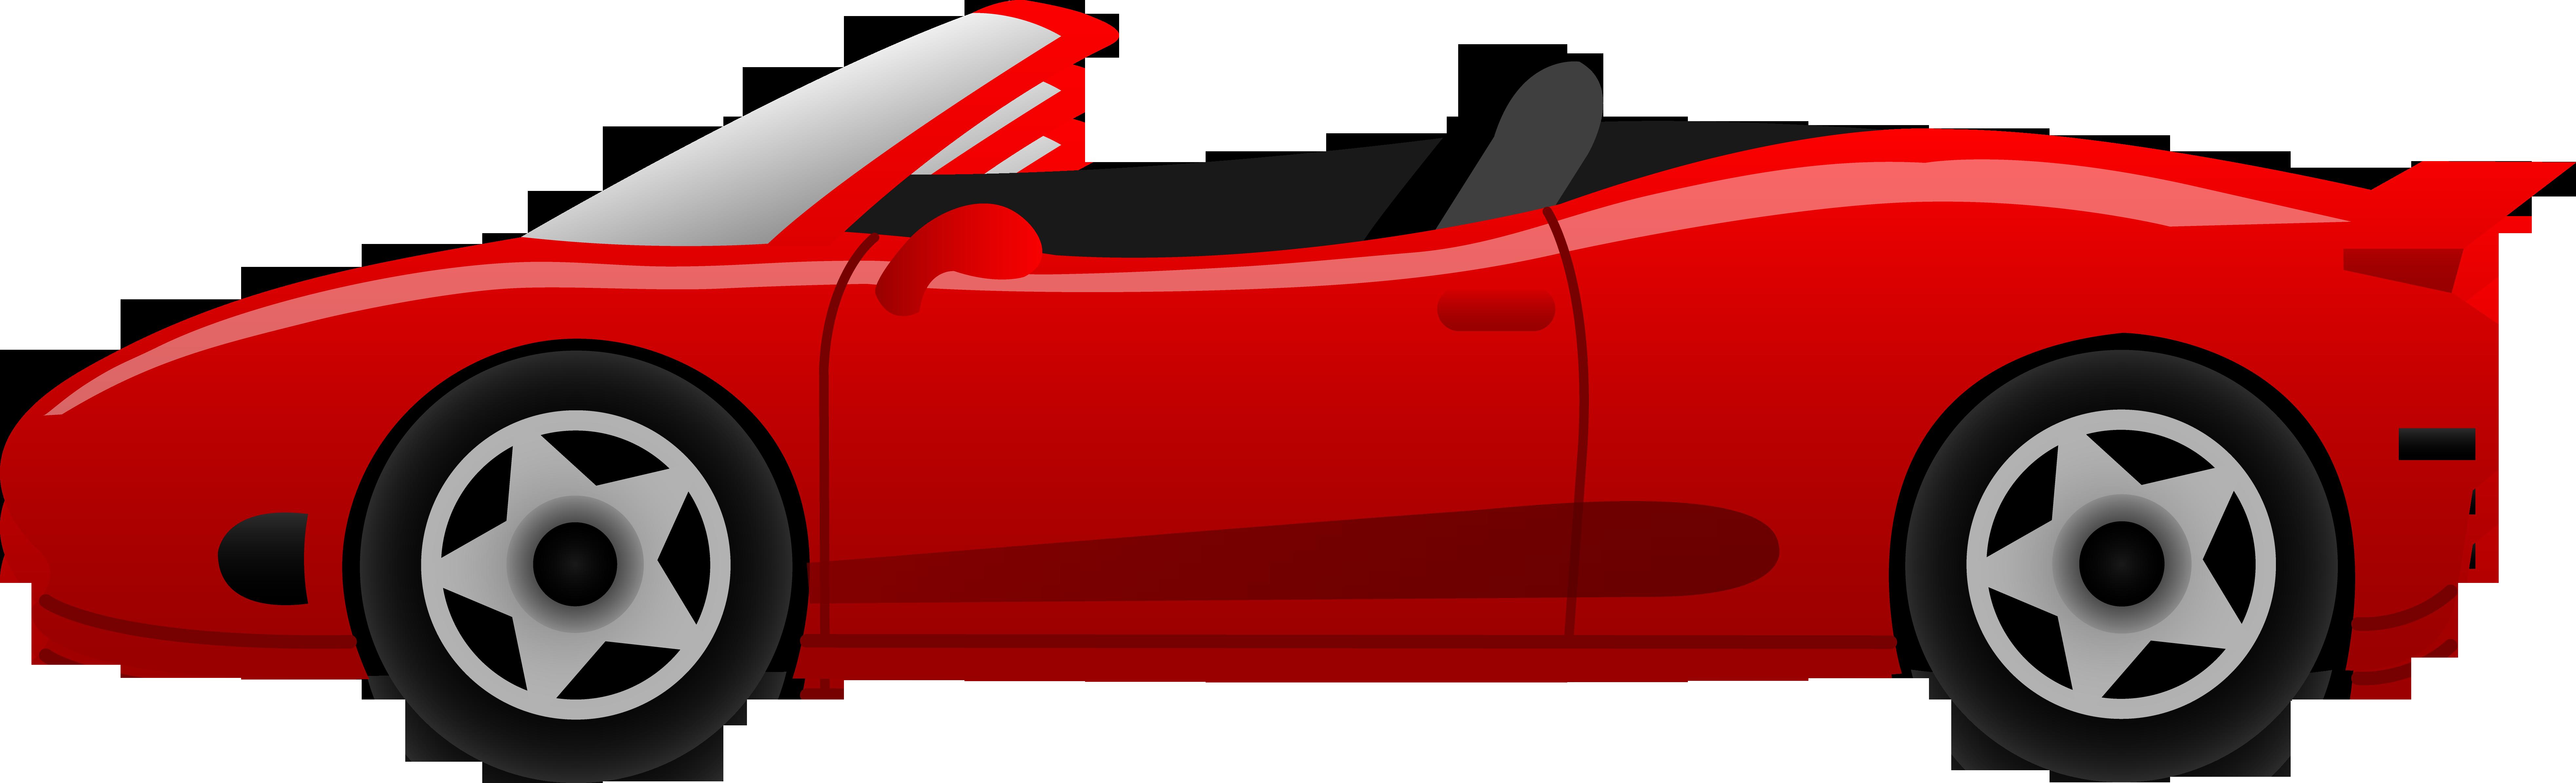 Cartoon car free clipart royalty free Sports car Ferrari Cartoon Clip art - Red sports car 7863*2391 ... royalty free